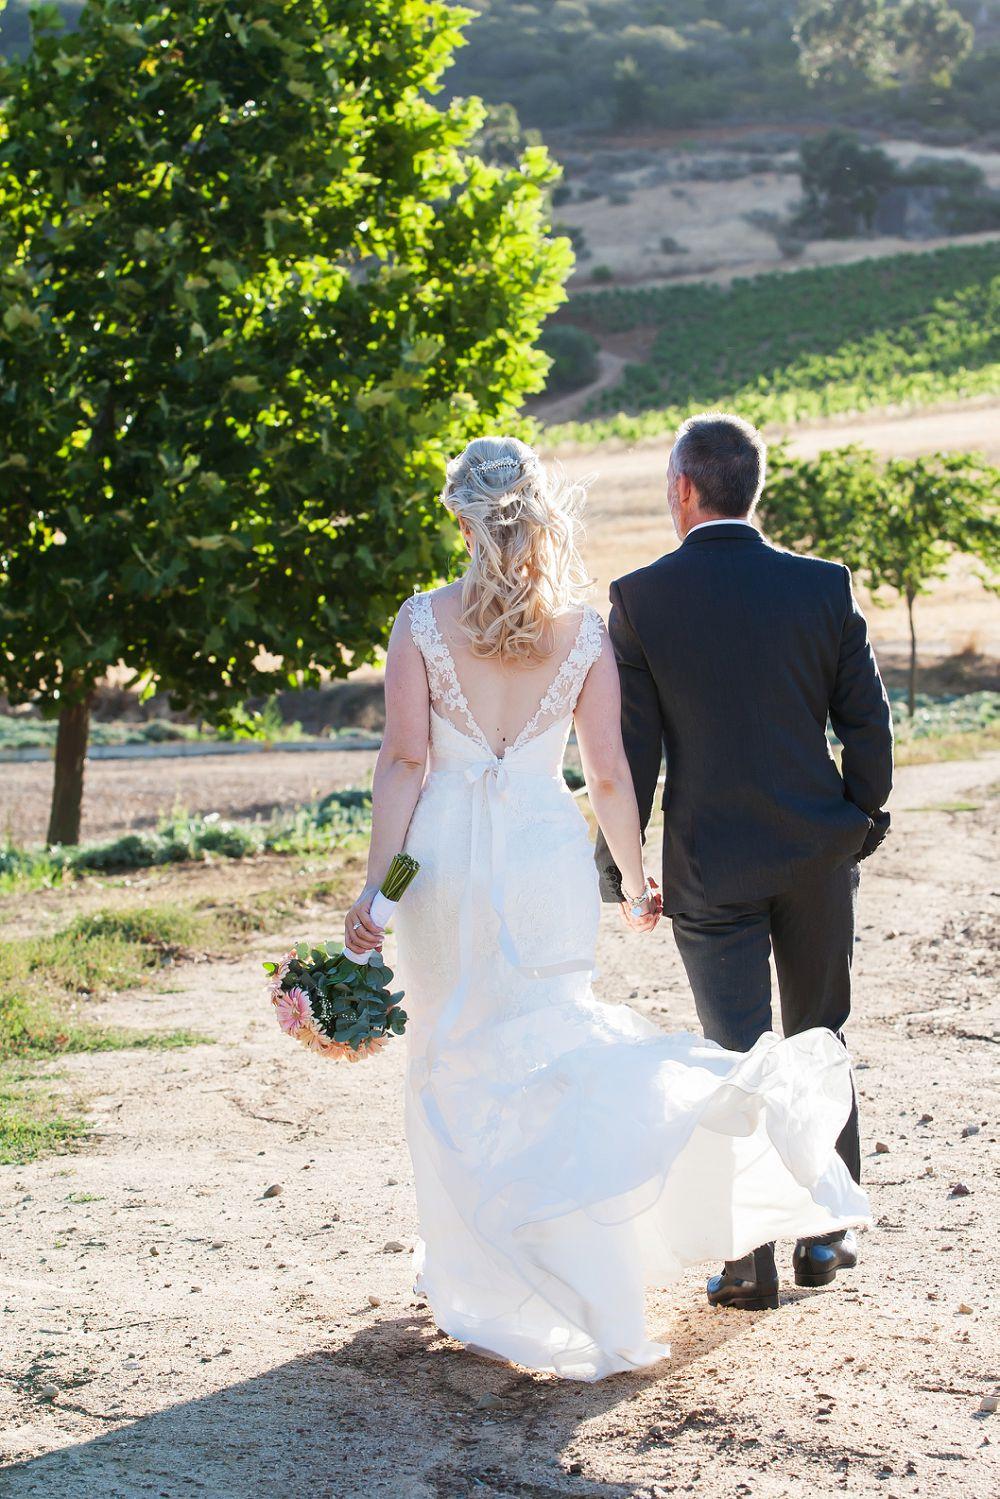 Rhebokslkoof Wedding Cape Town Wedding Photgraphers Expressions Photography 105